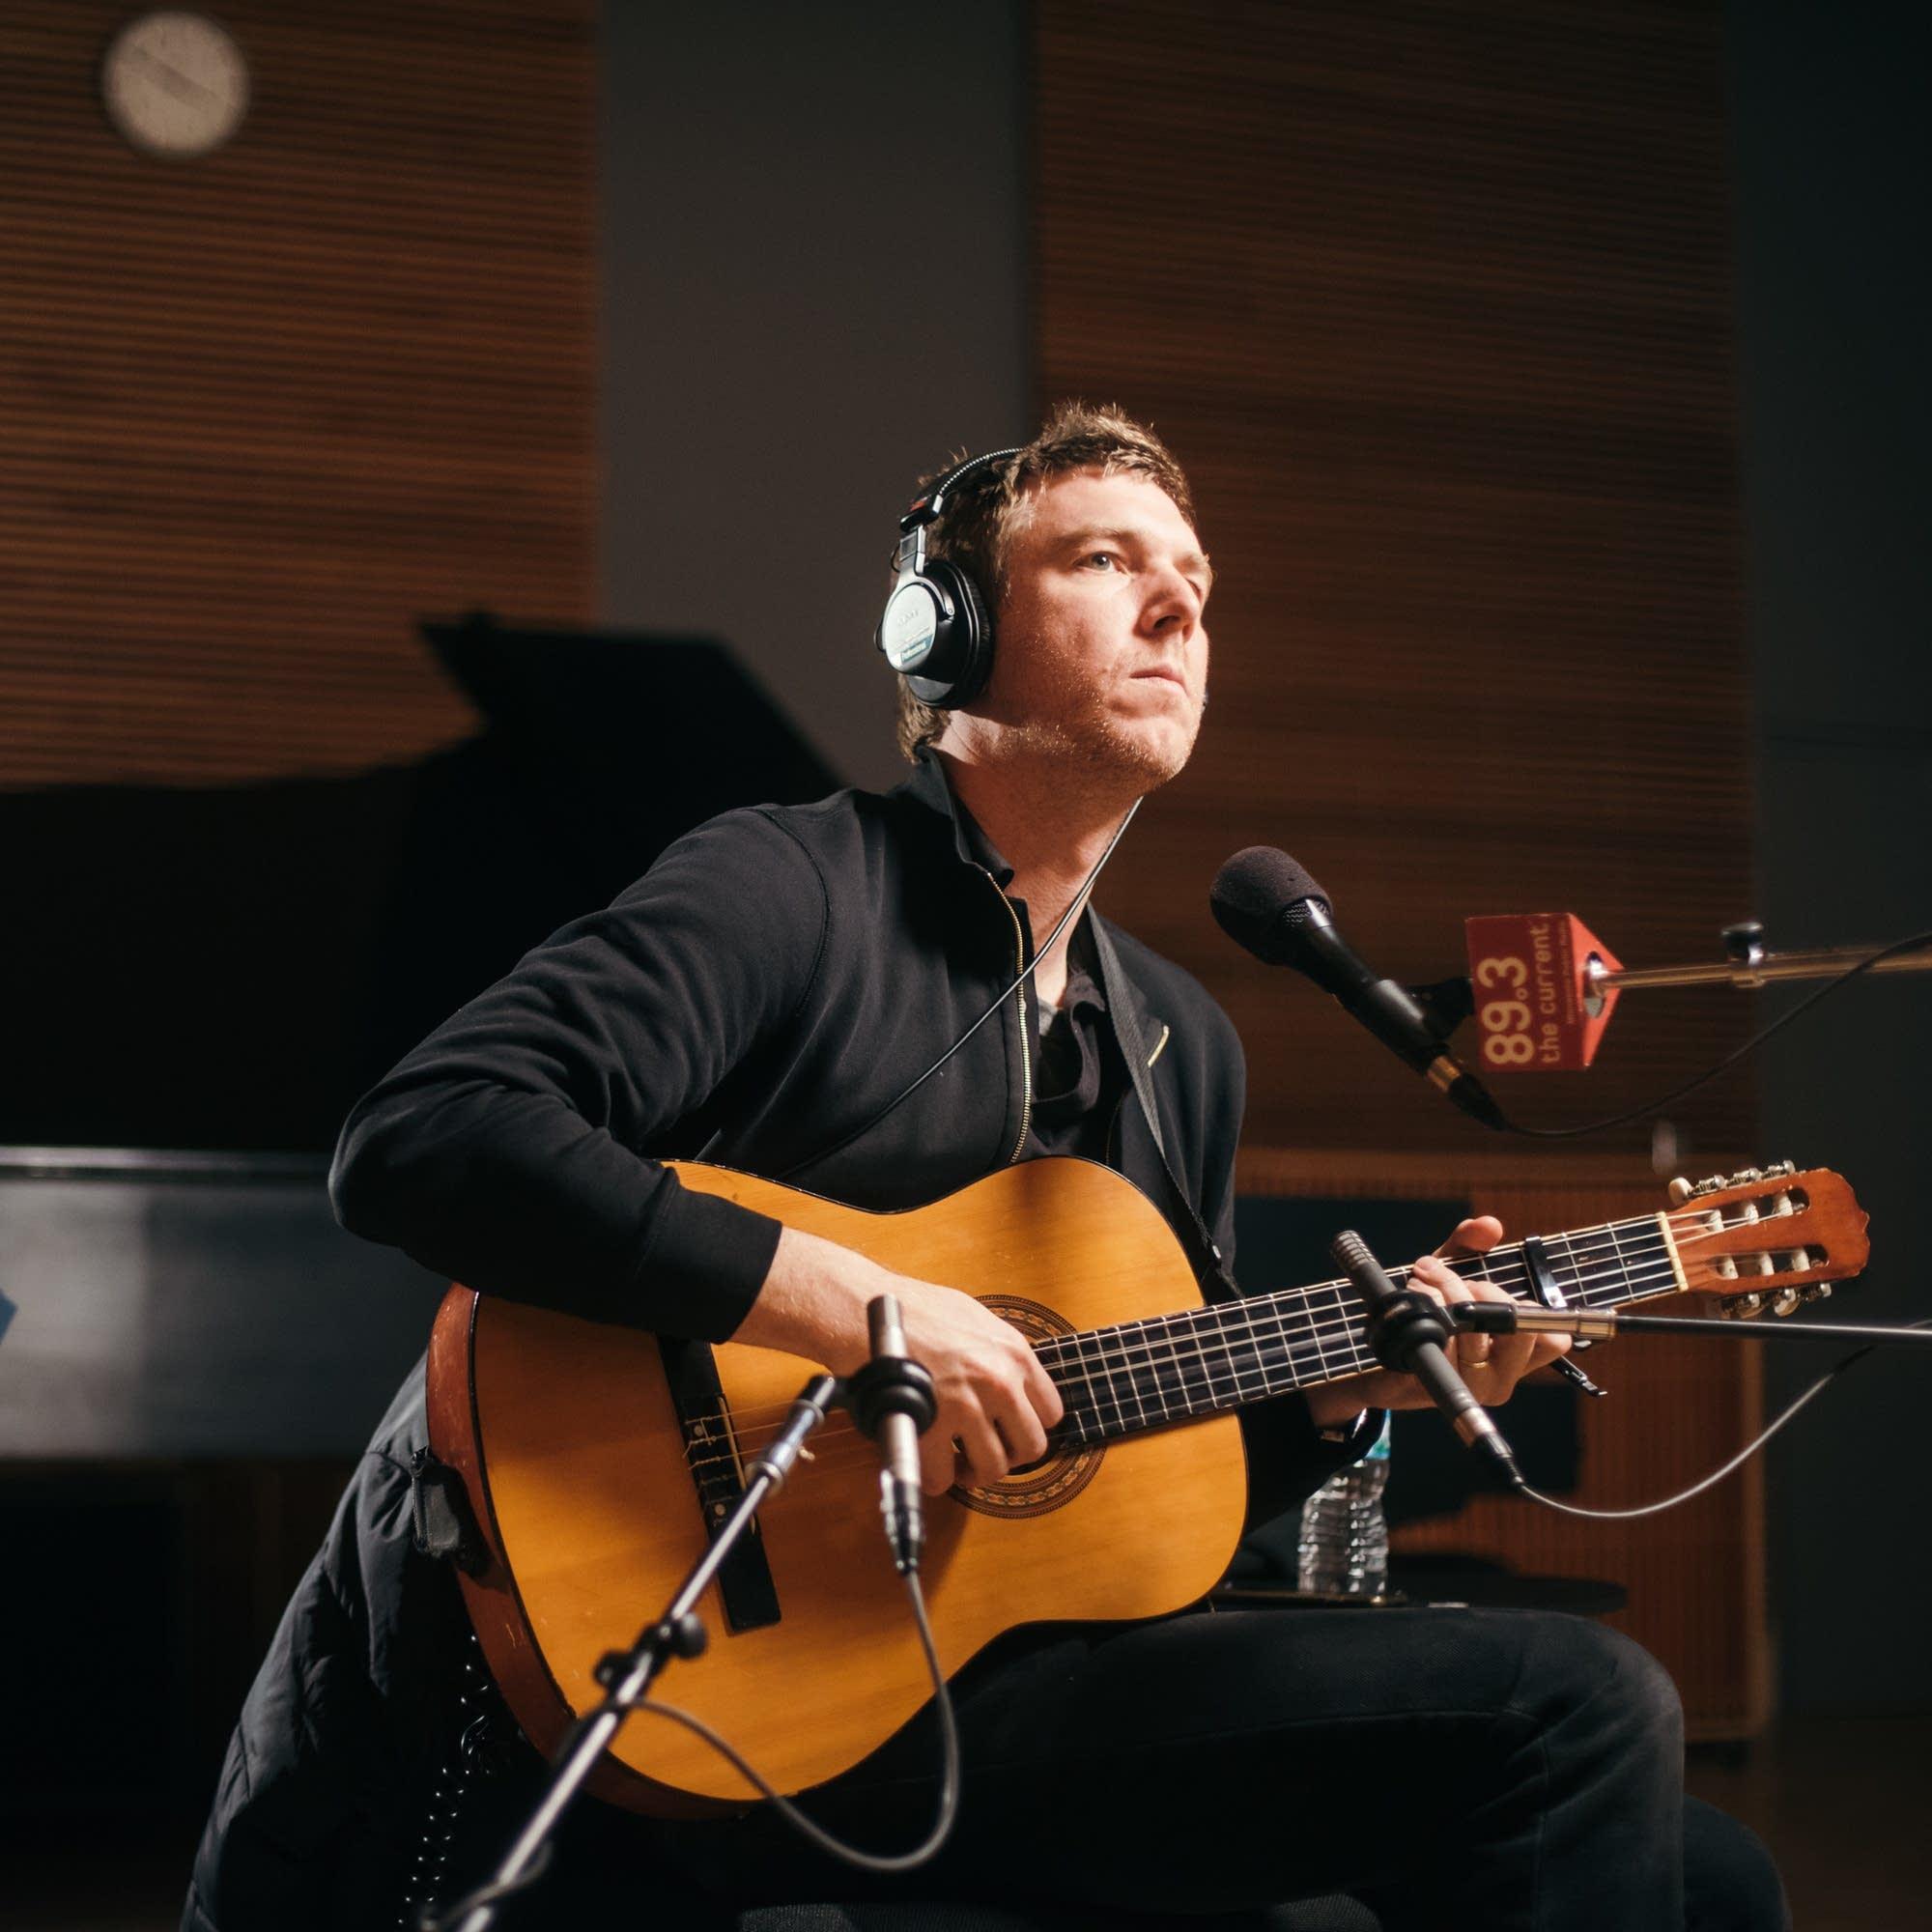 Hamilton Leithauser performs a solo acoustic set